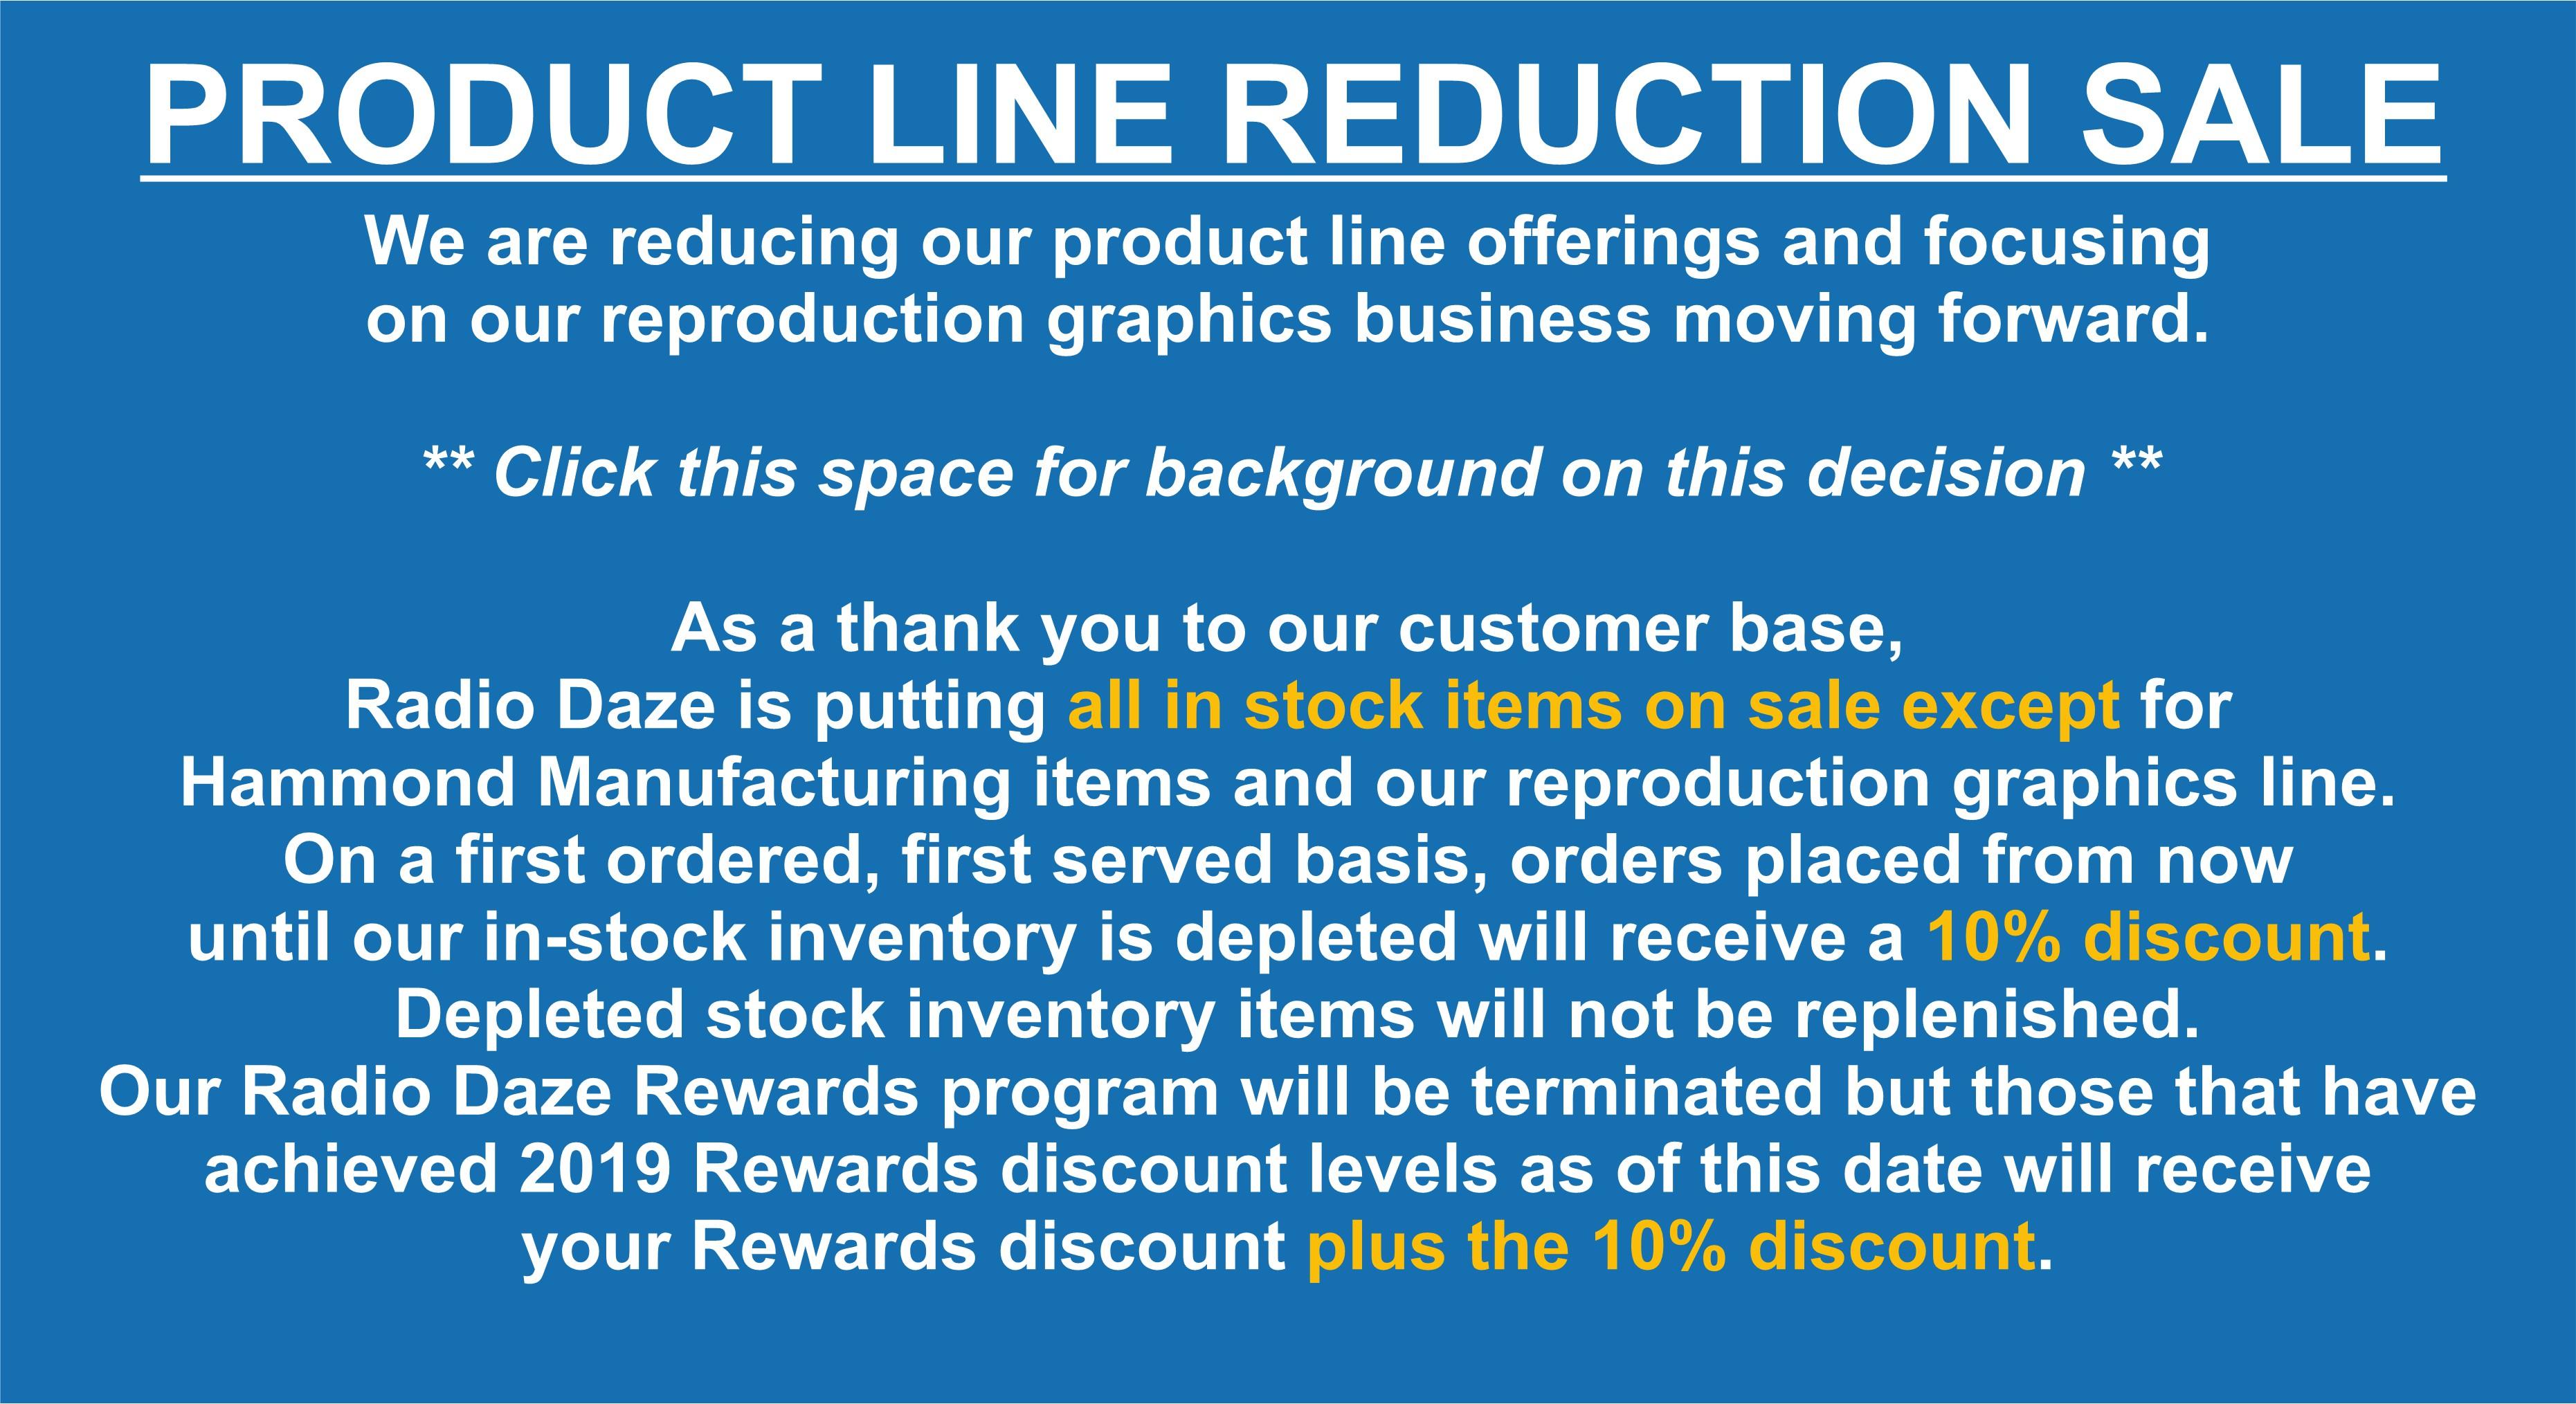 reductionsale-banner.jpg